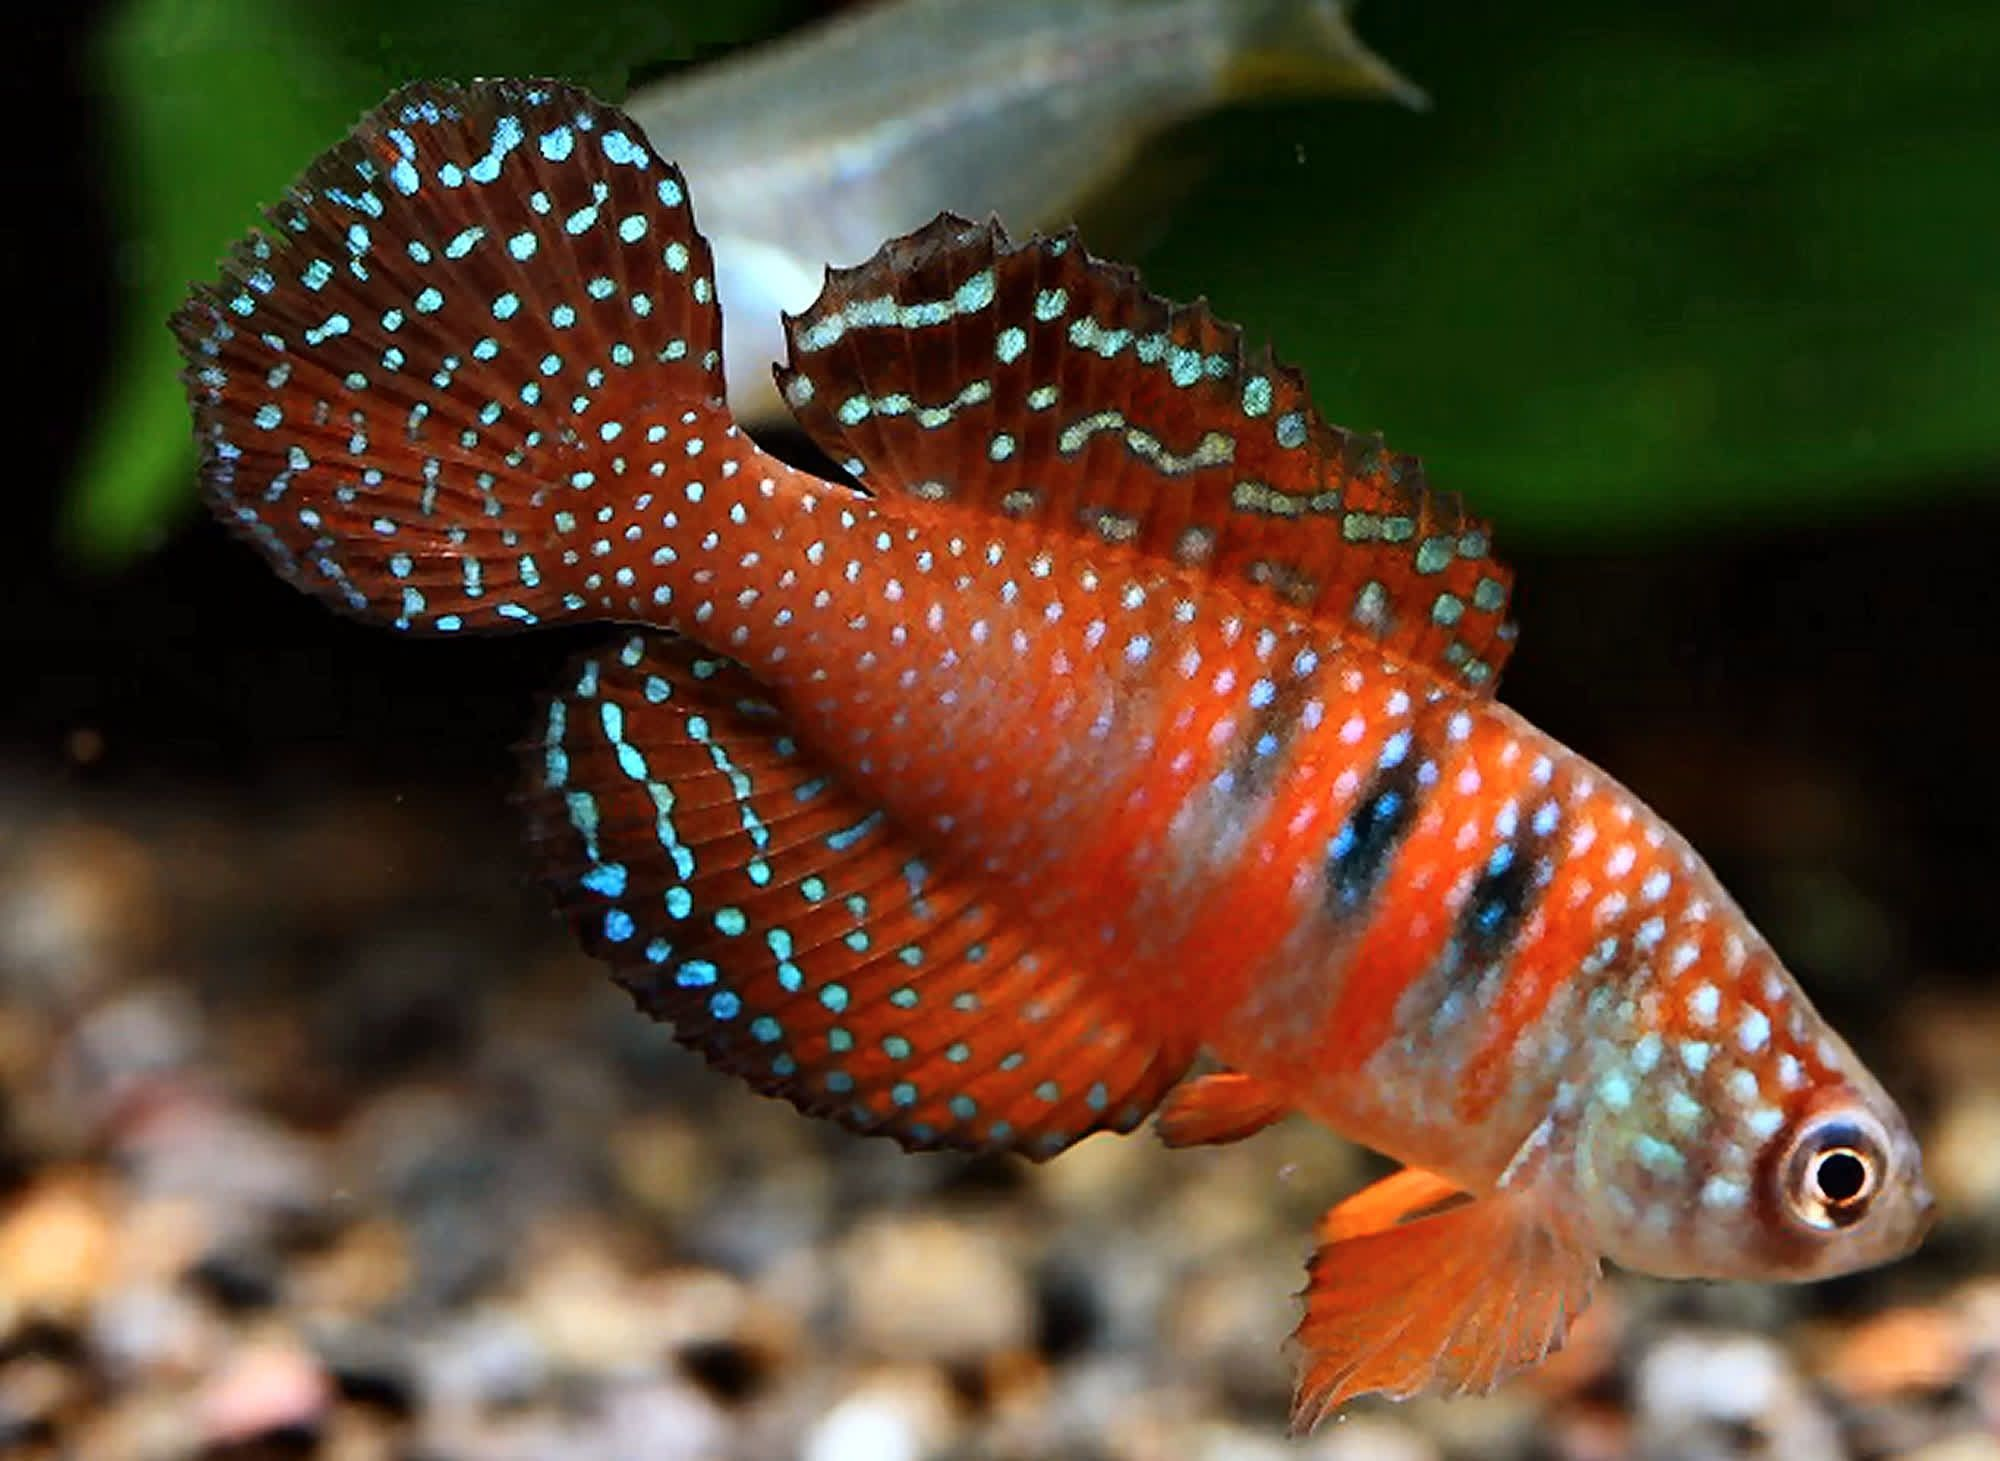 Online Aqurium Shopping Secrets Advice And Tips You Need In 2020 Tropical Fish Aquarium Freshwater Fish Aquarium Fish